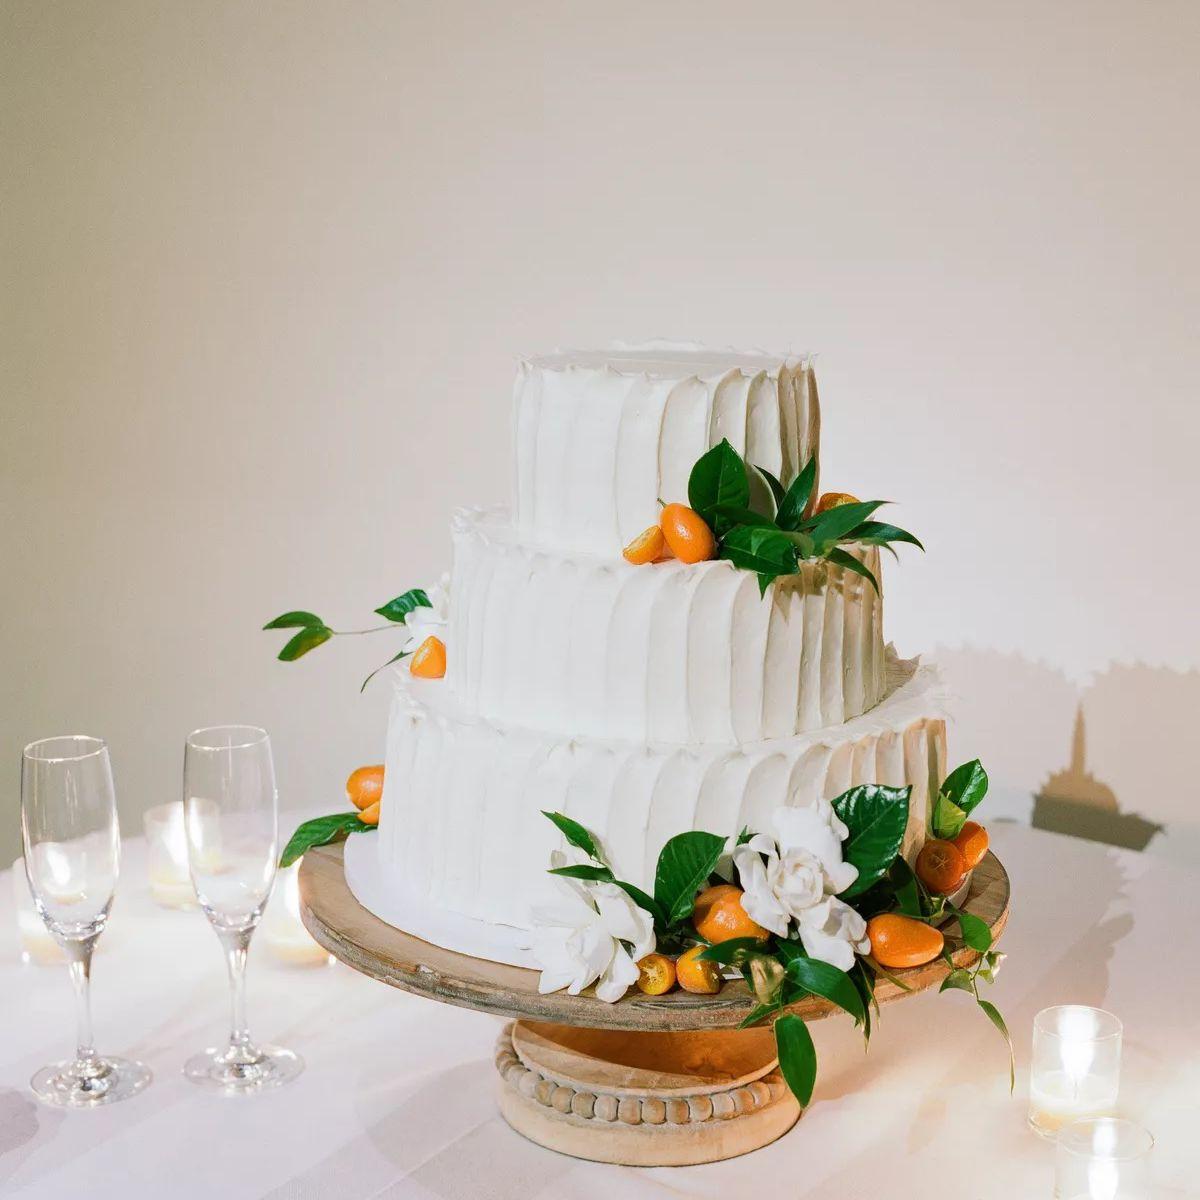 wedding cake with tangerines